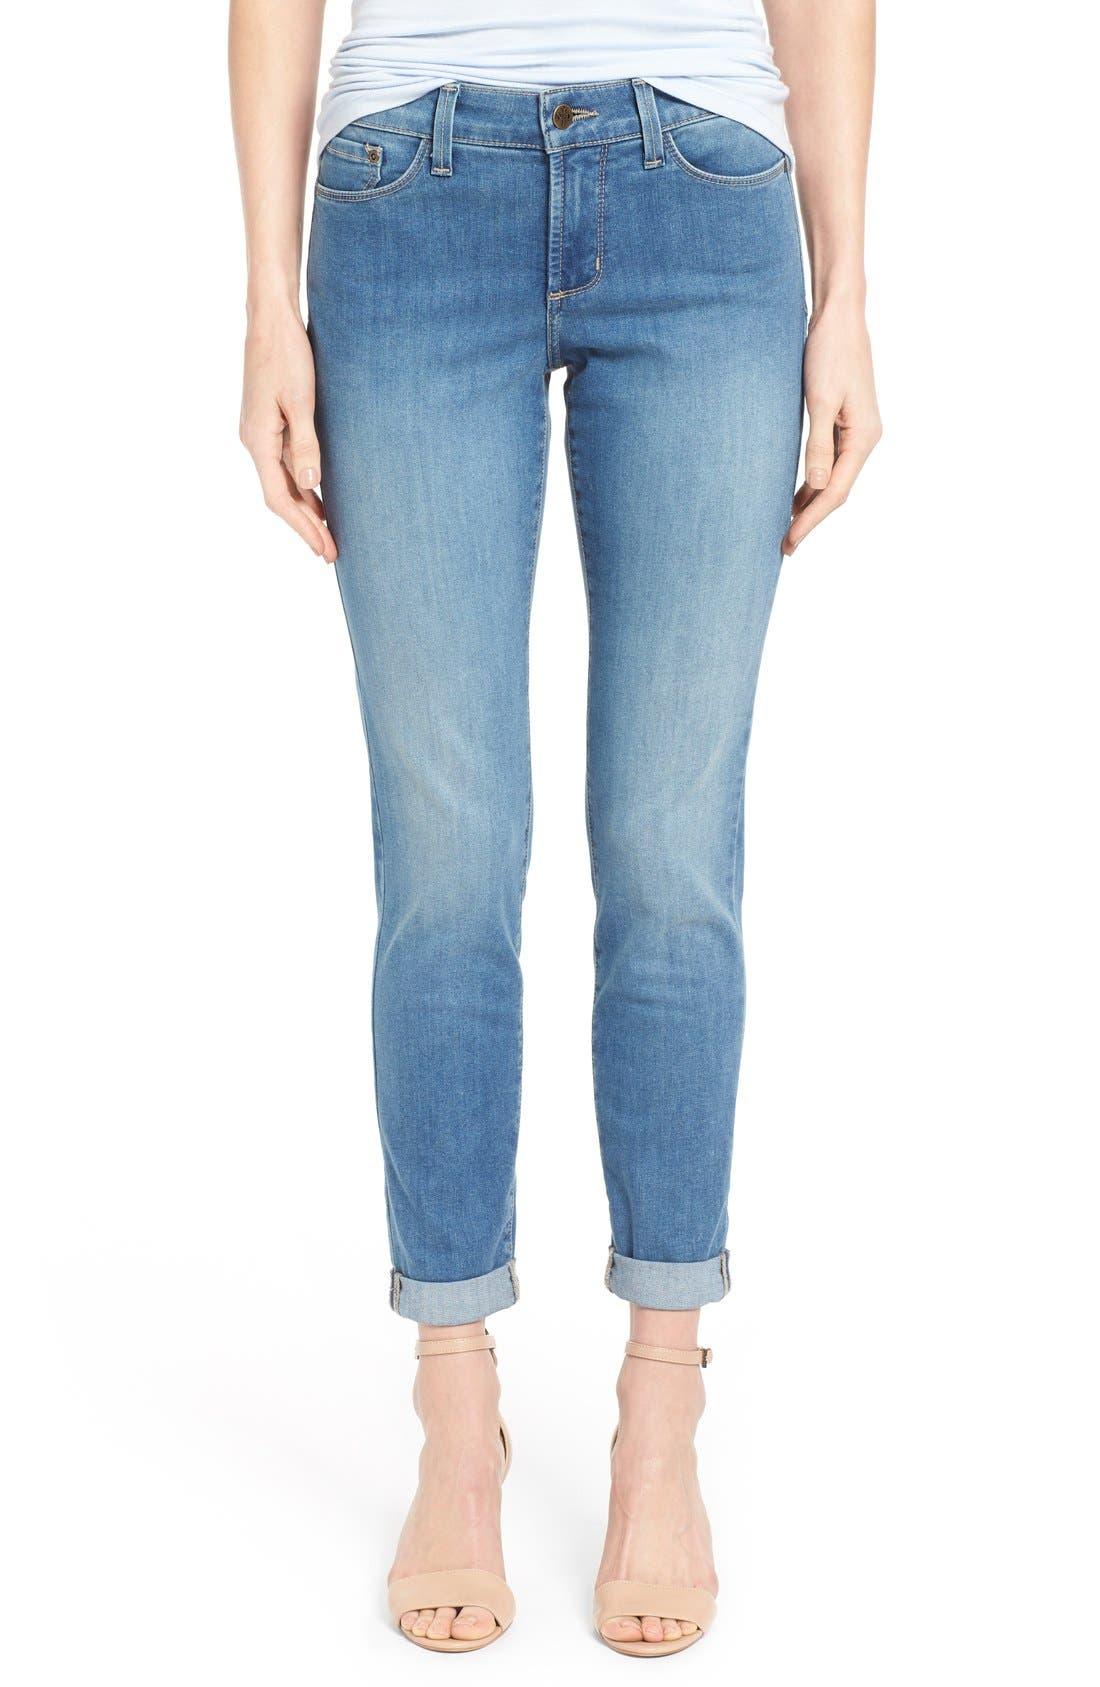 Alternate Image 1 Selected - NYDJ 'Anabelle' Stretch Skinny Boyfriend Jeans (Upper Falls) (Regular & Petite)